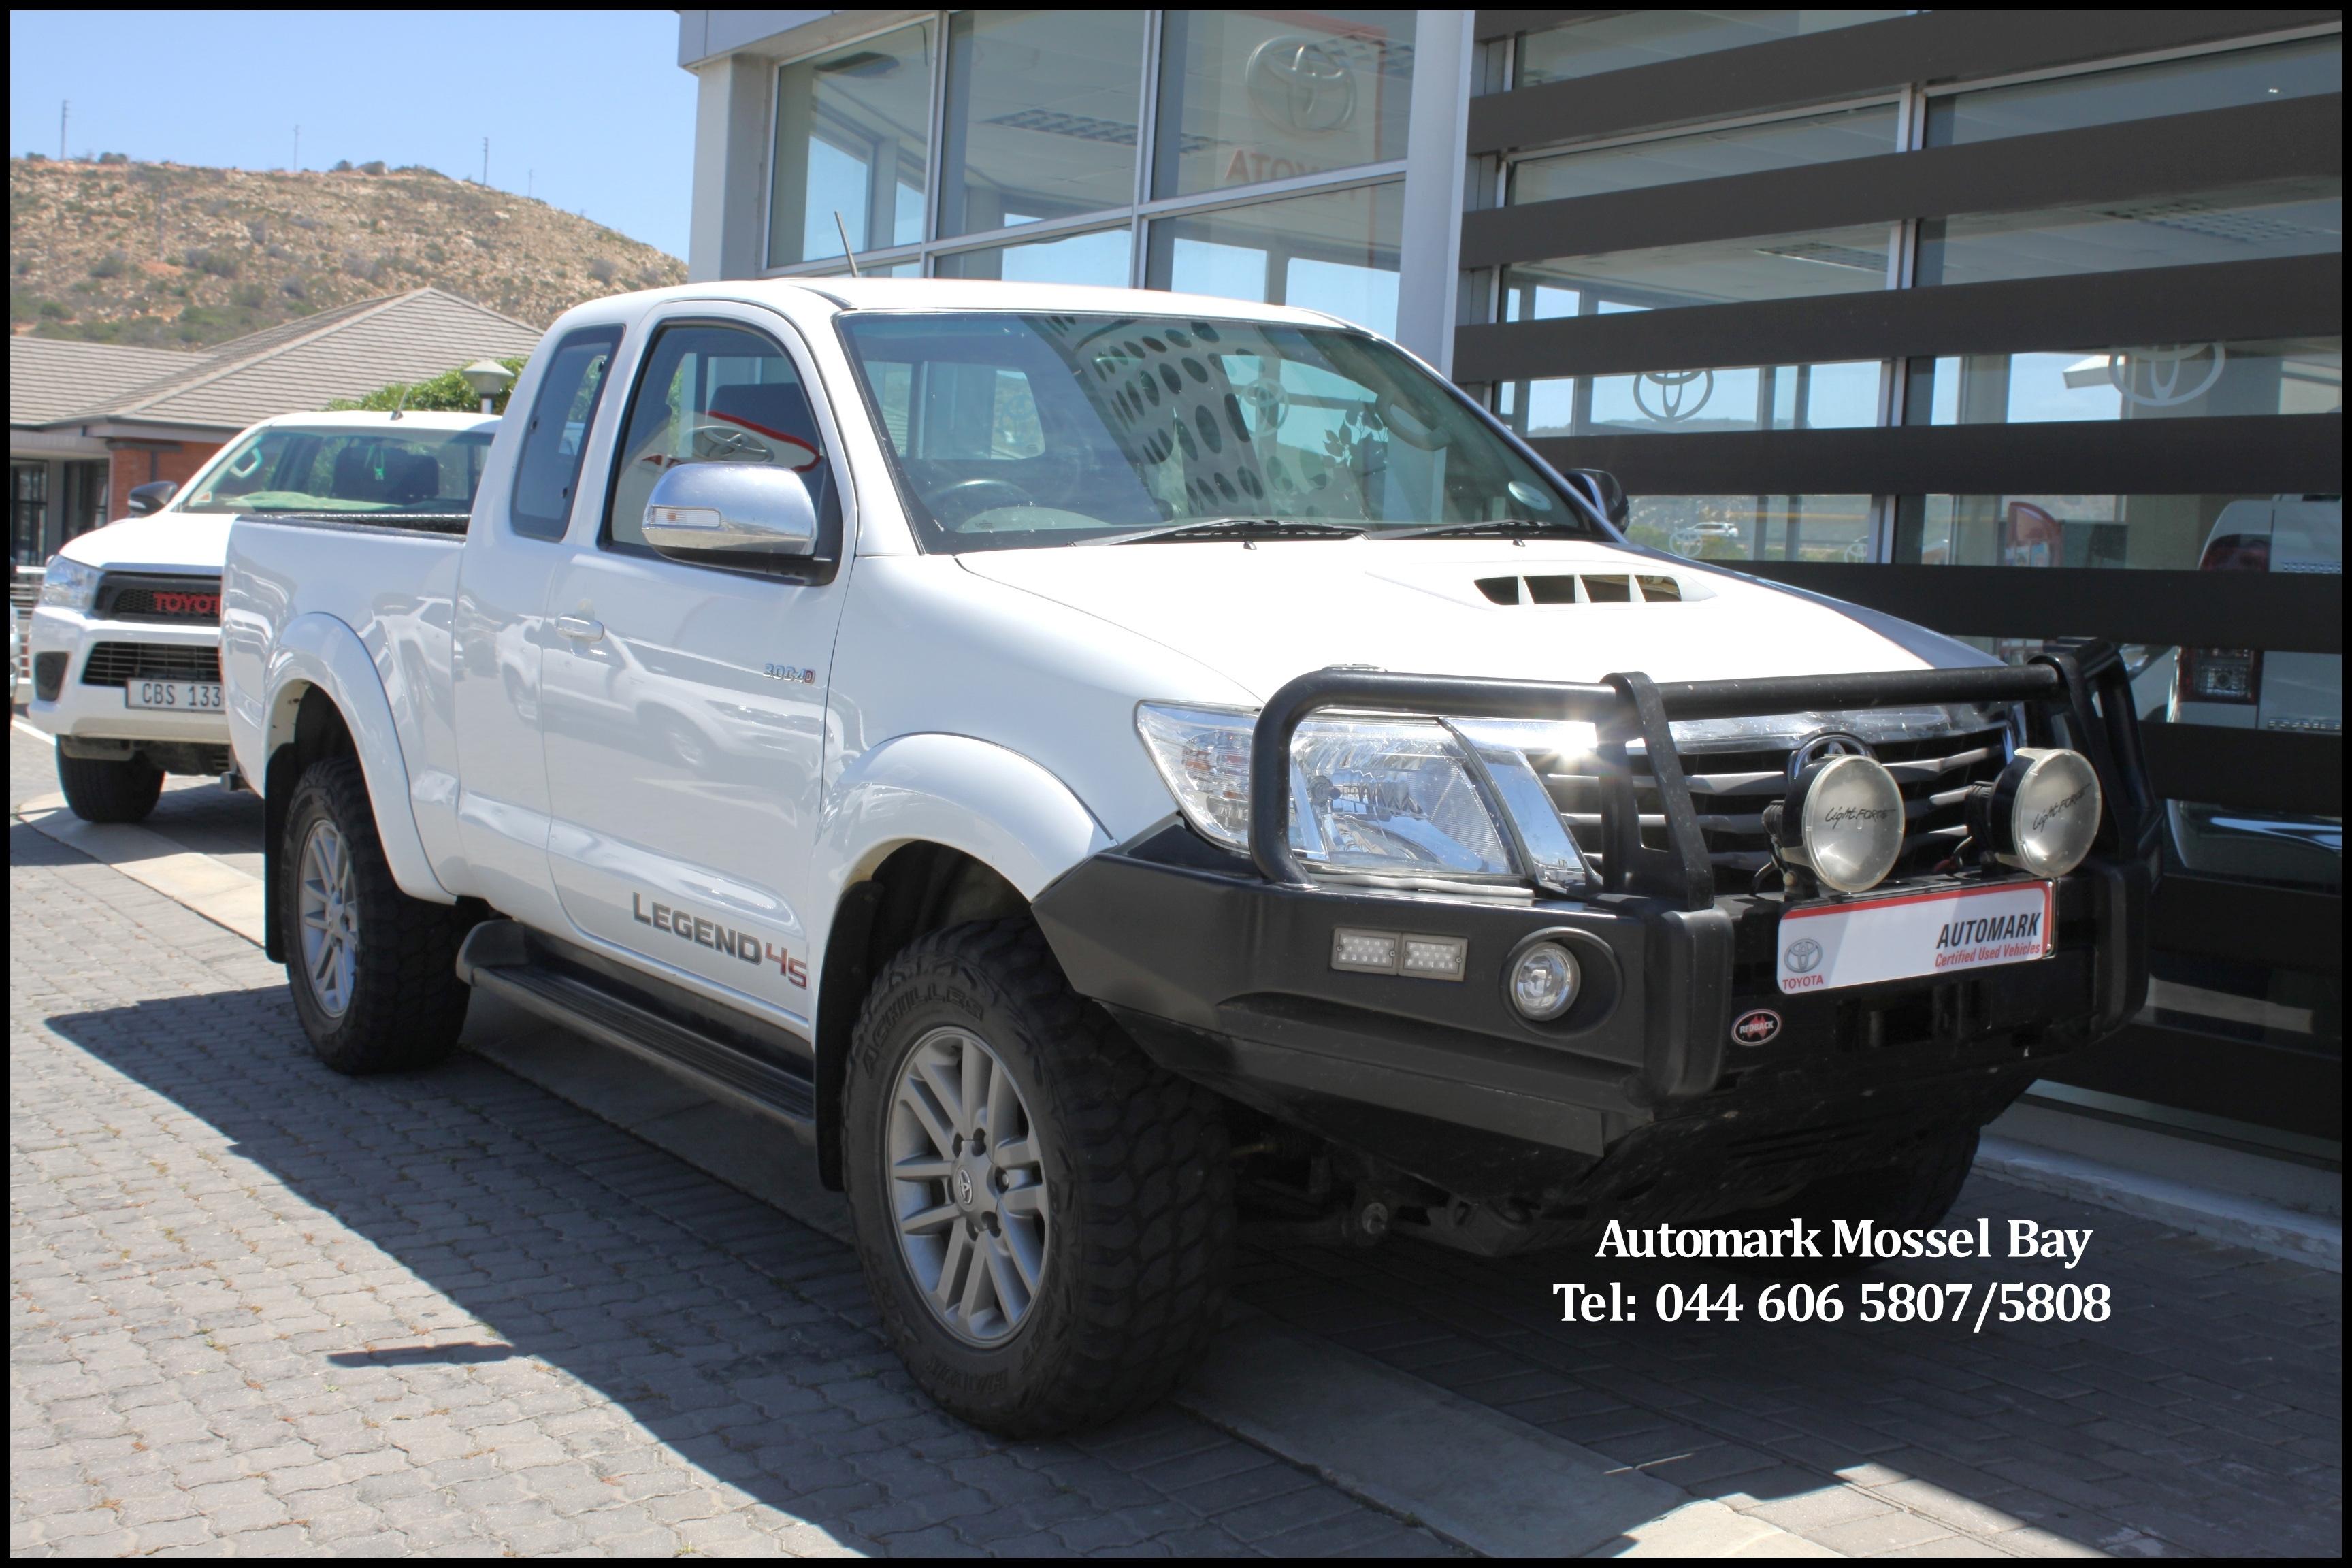 Toyota Hilux 2018 Elegant toyota Hilux 2018 Reviews 2015 toyota Hilux 3 0d 4d Legend 45